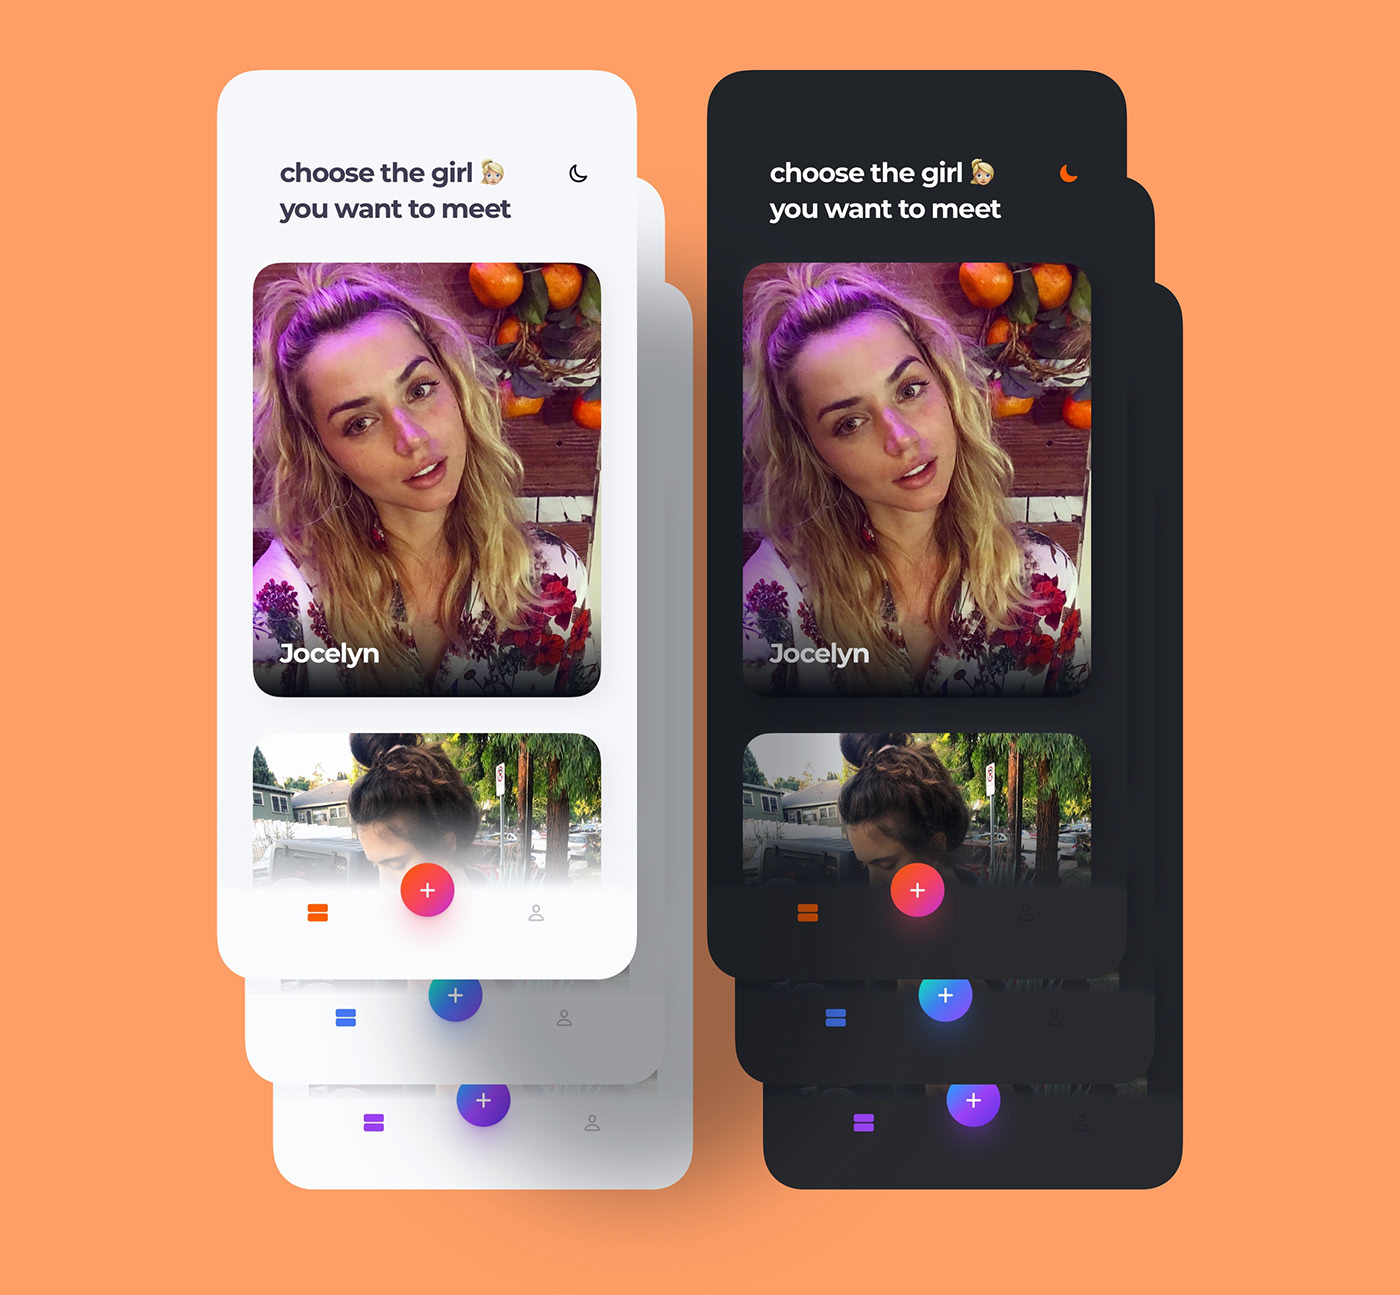 app Crypto design Dating dating app Dating App UI Mobile app neural network UI UX design